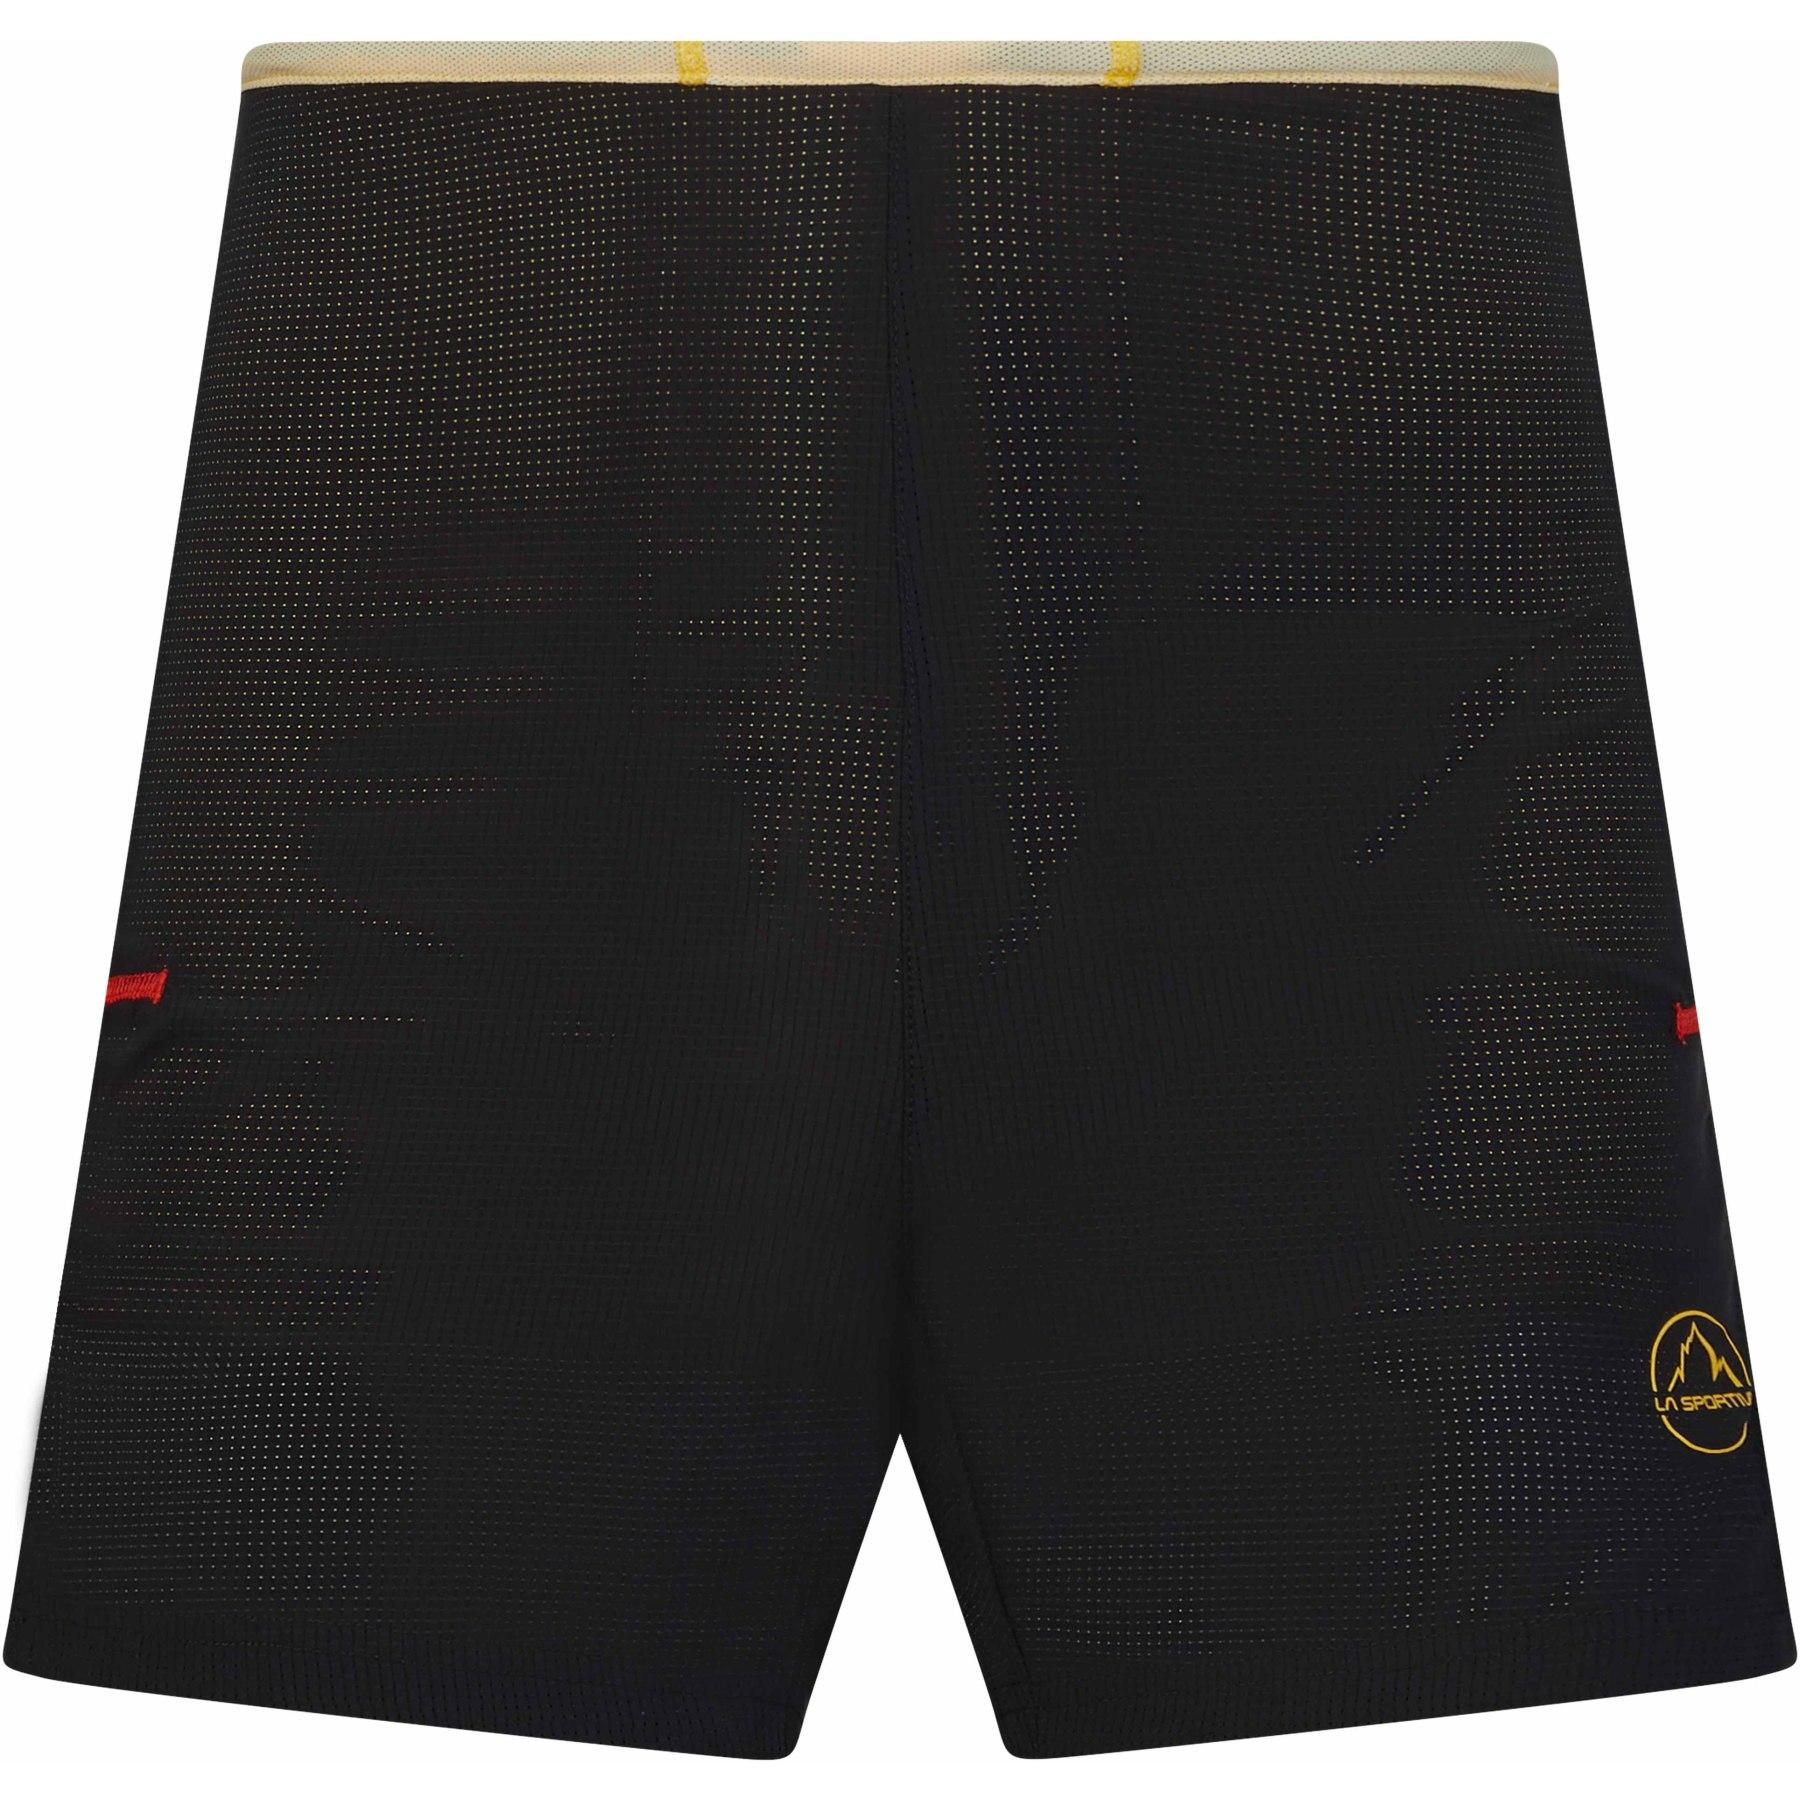 La Sportiva Freccia Shorts - Schwarz/Gelb